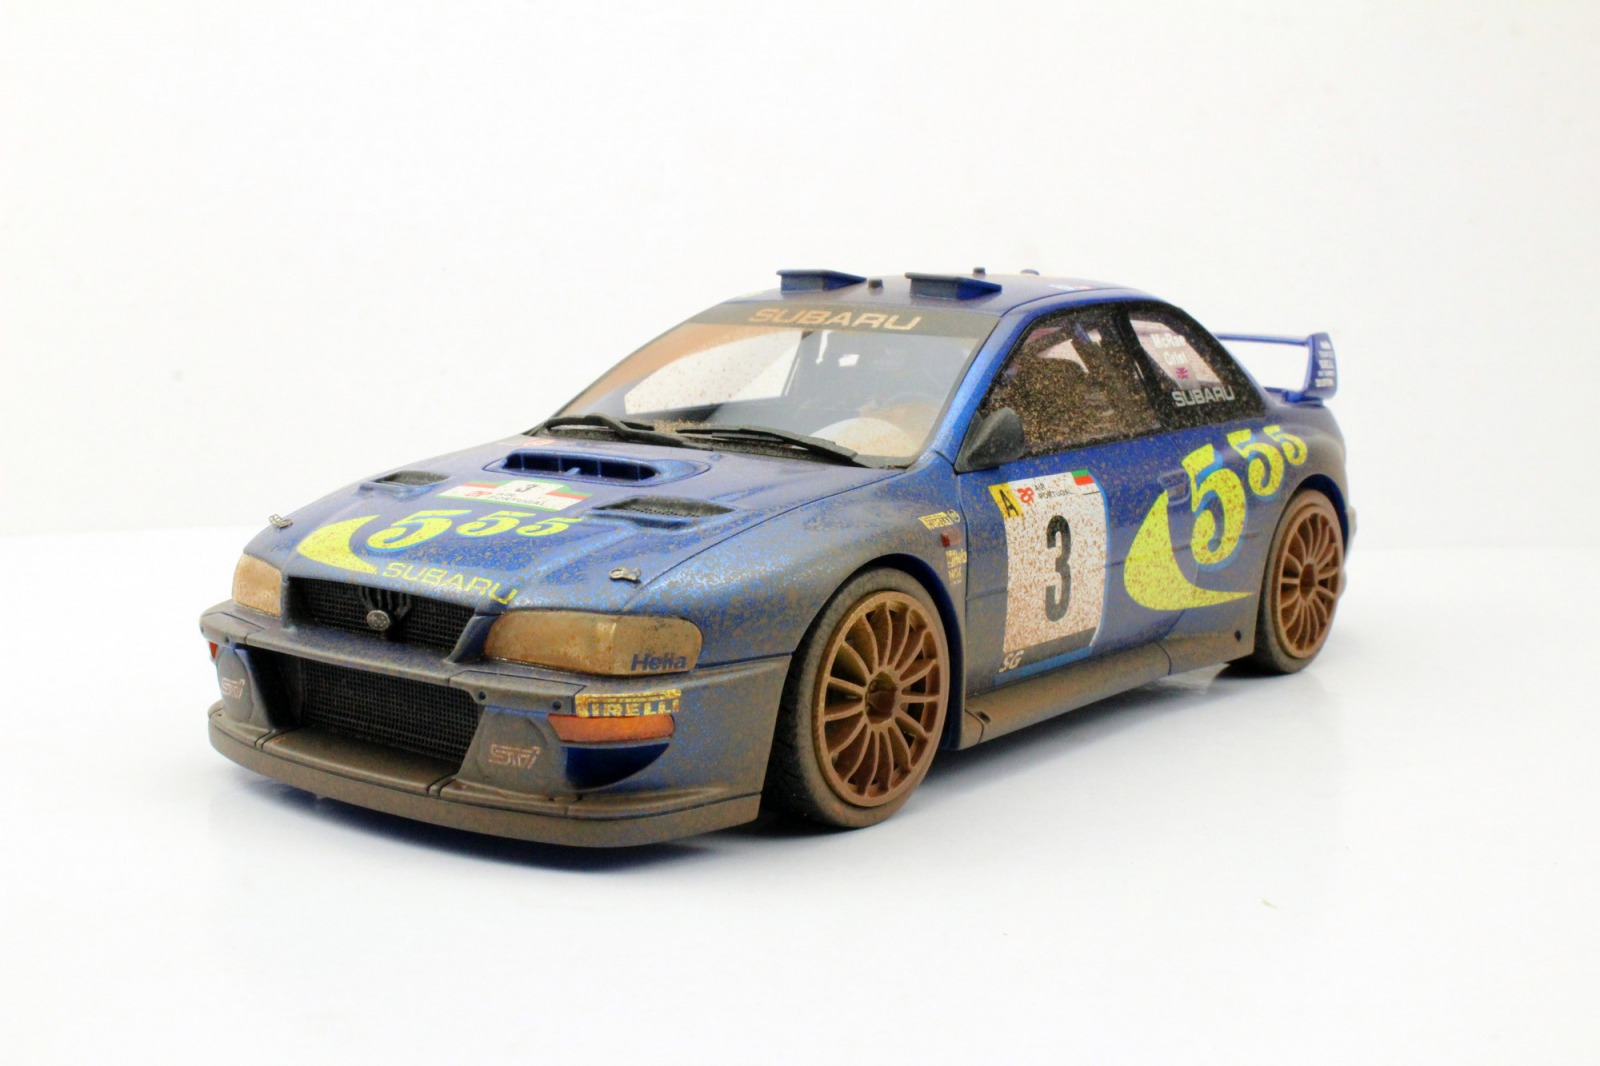 Top Marques トップマルケス 1/18 ミニカー レジン プロポーションモデル 1998年ラリーポルトガル優勝 スバル インプレッサ S4 WRC No.3 汚れ仕様SUBARU - IMPREZA S4 WRC N 3 WINNER RALLY PORTUGAL DIRTY VERSION 1998 C.MCRAE - N.GRIST 1:18 Top Marques